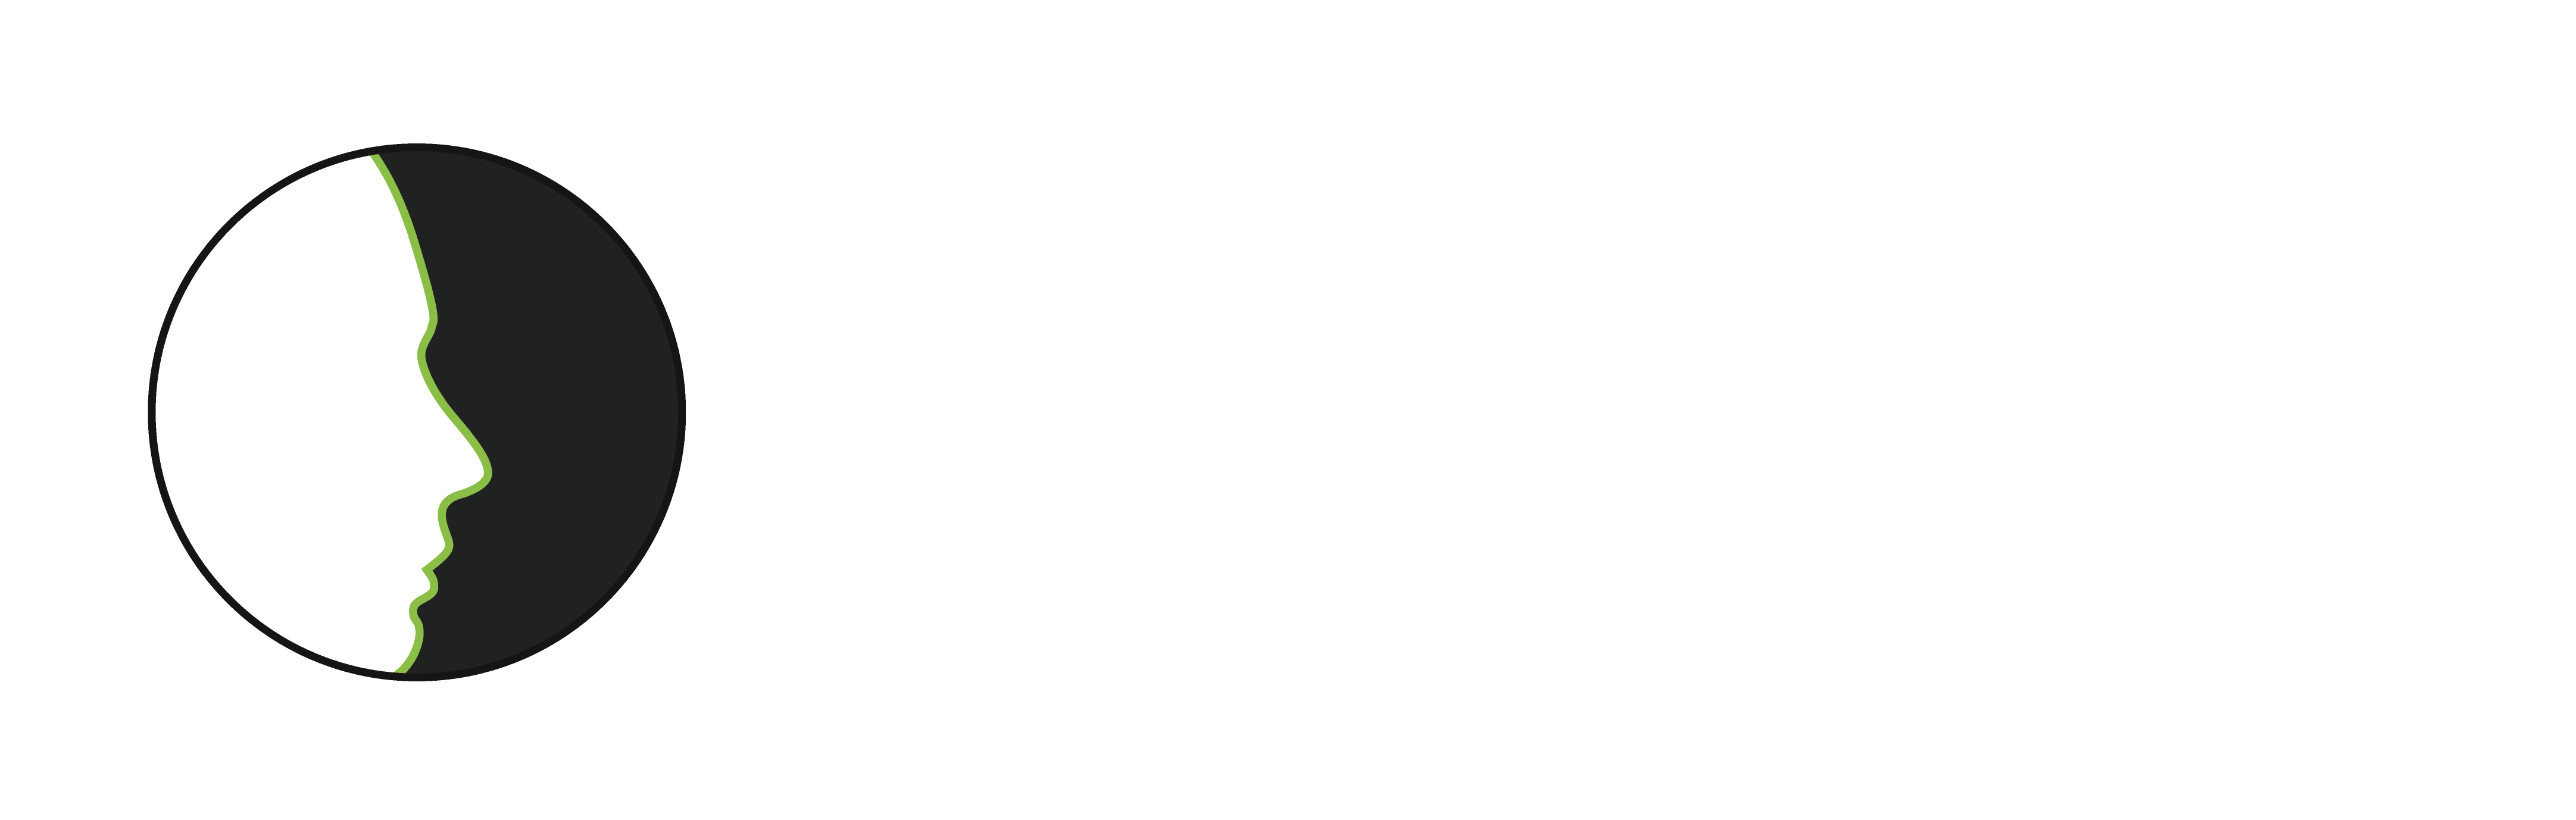 logo lezione online